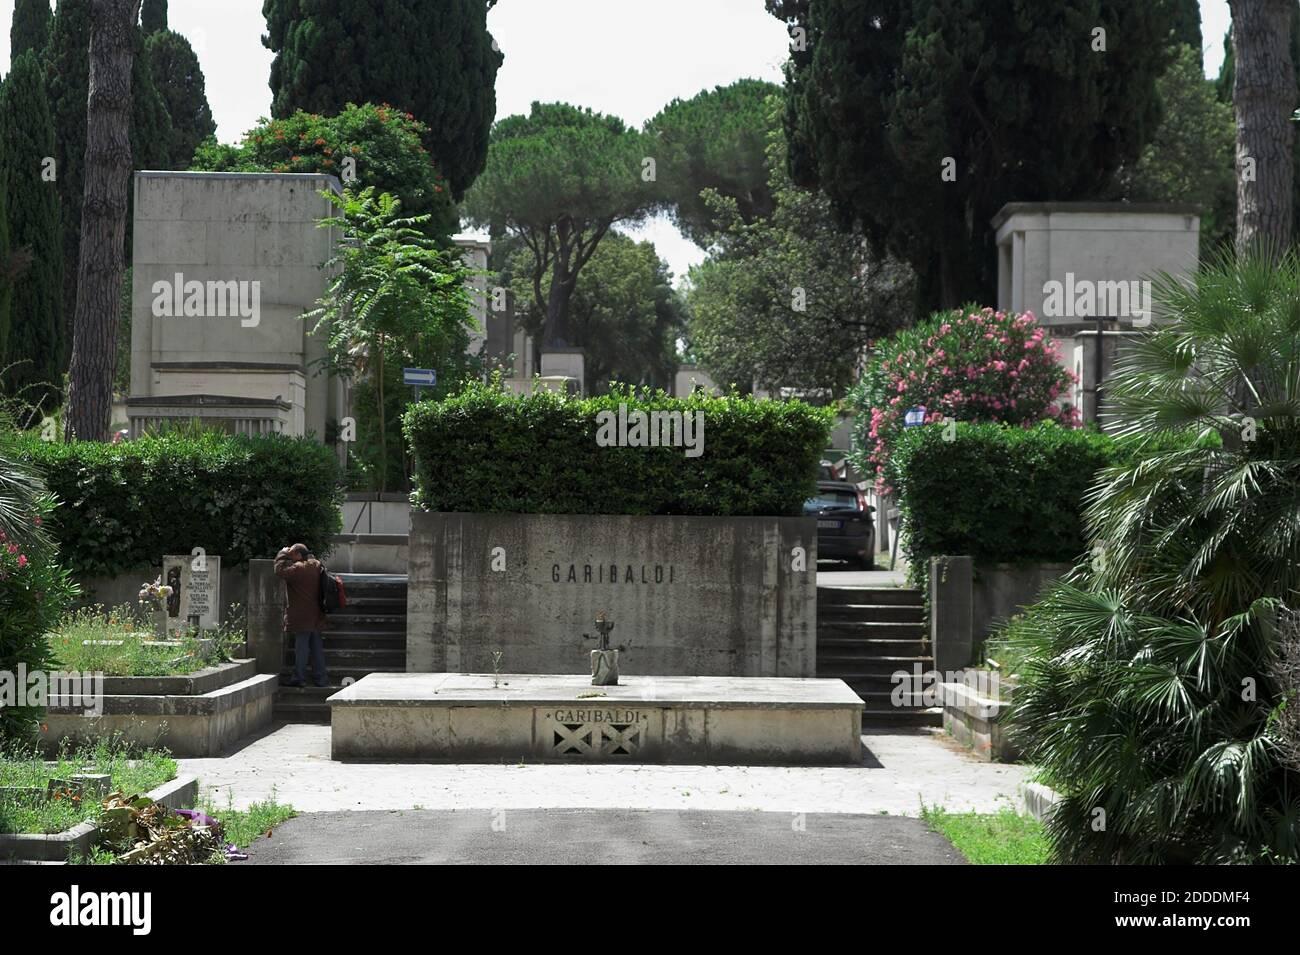 Roma, Rom, Italy, Italien; Cimitero del Verano; Campo Verano; Garibaldi family tomb. Garibaldi Familiengrab. 加里波第家族墓。Grób rodziny Garibaldi. Stock Photo